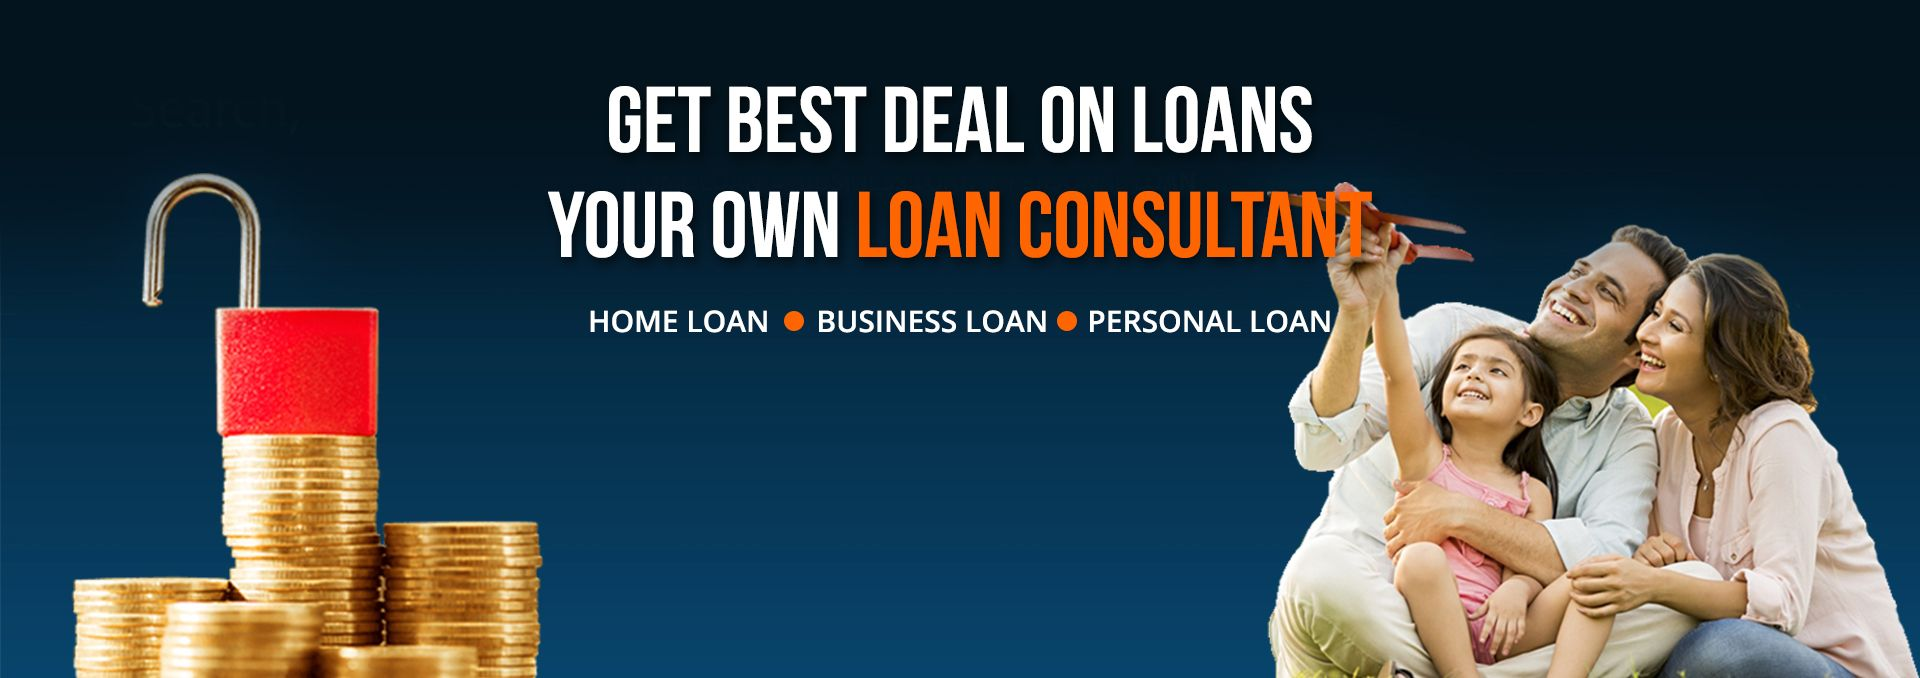 Pin by Pallab Mukherjee on ikrab Business loans